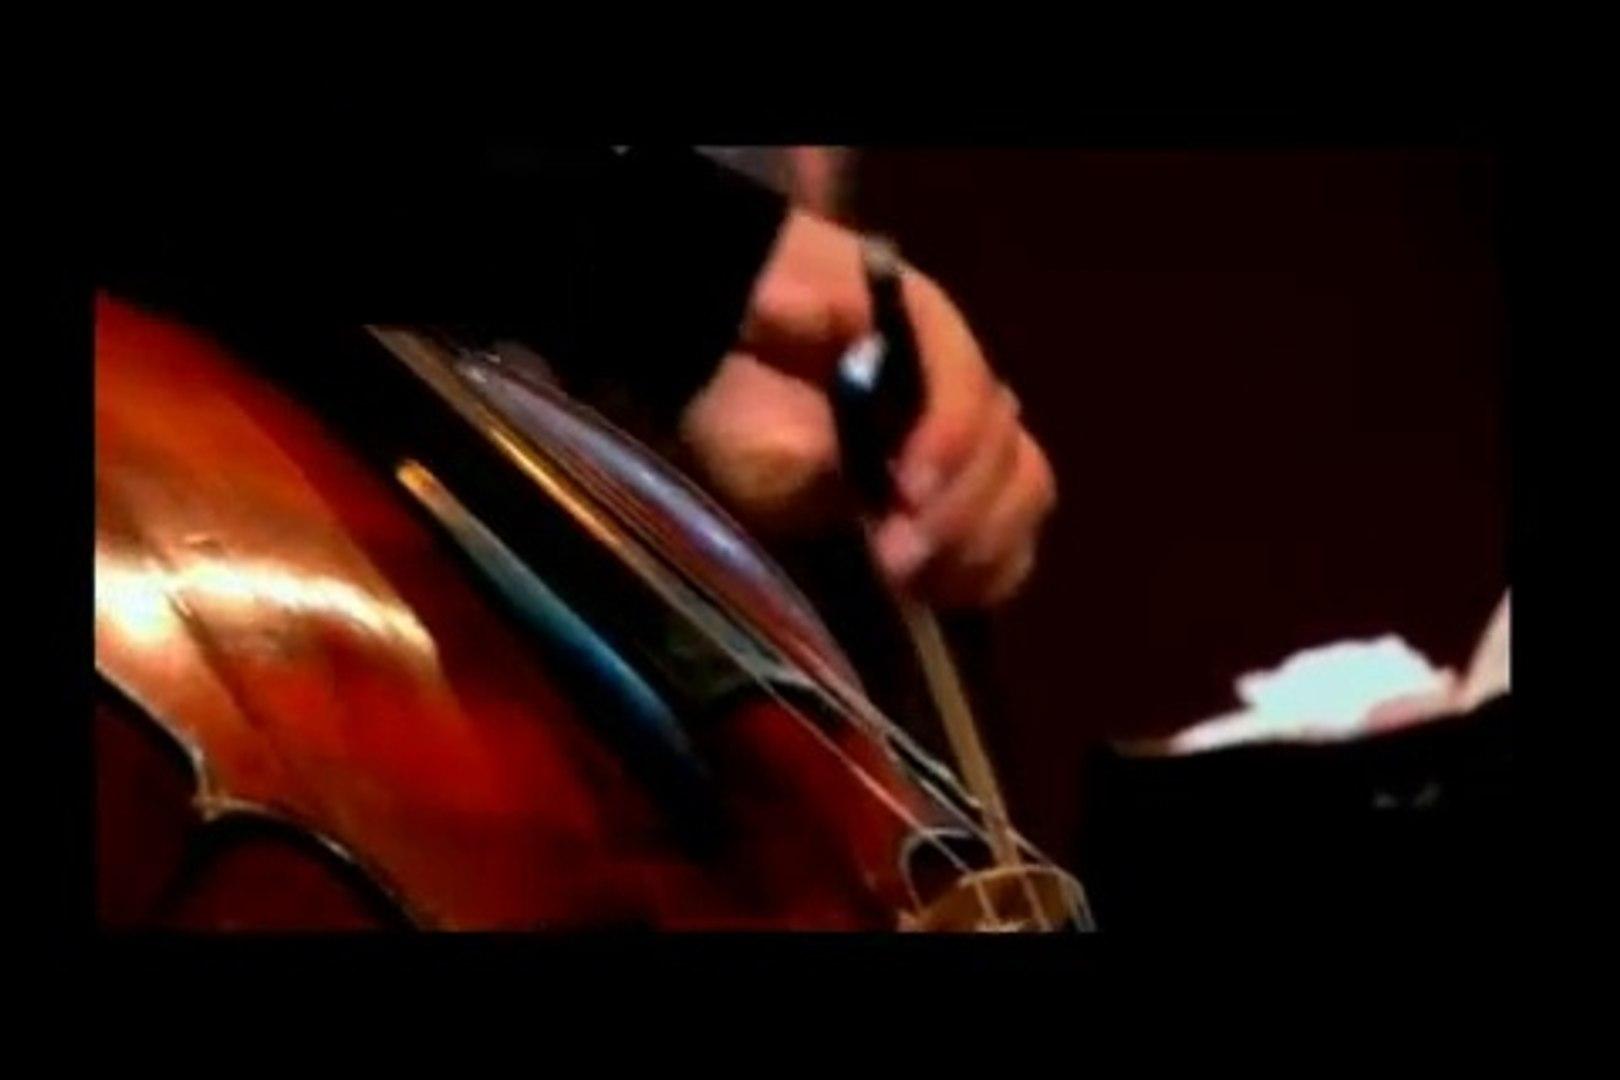 Oh  ! MARTHA ARGERICH & MISHA MAISKY GRIEG Cello Sonata Op 36 LIVE 2008  (Bravura Sonata)